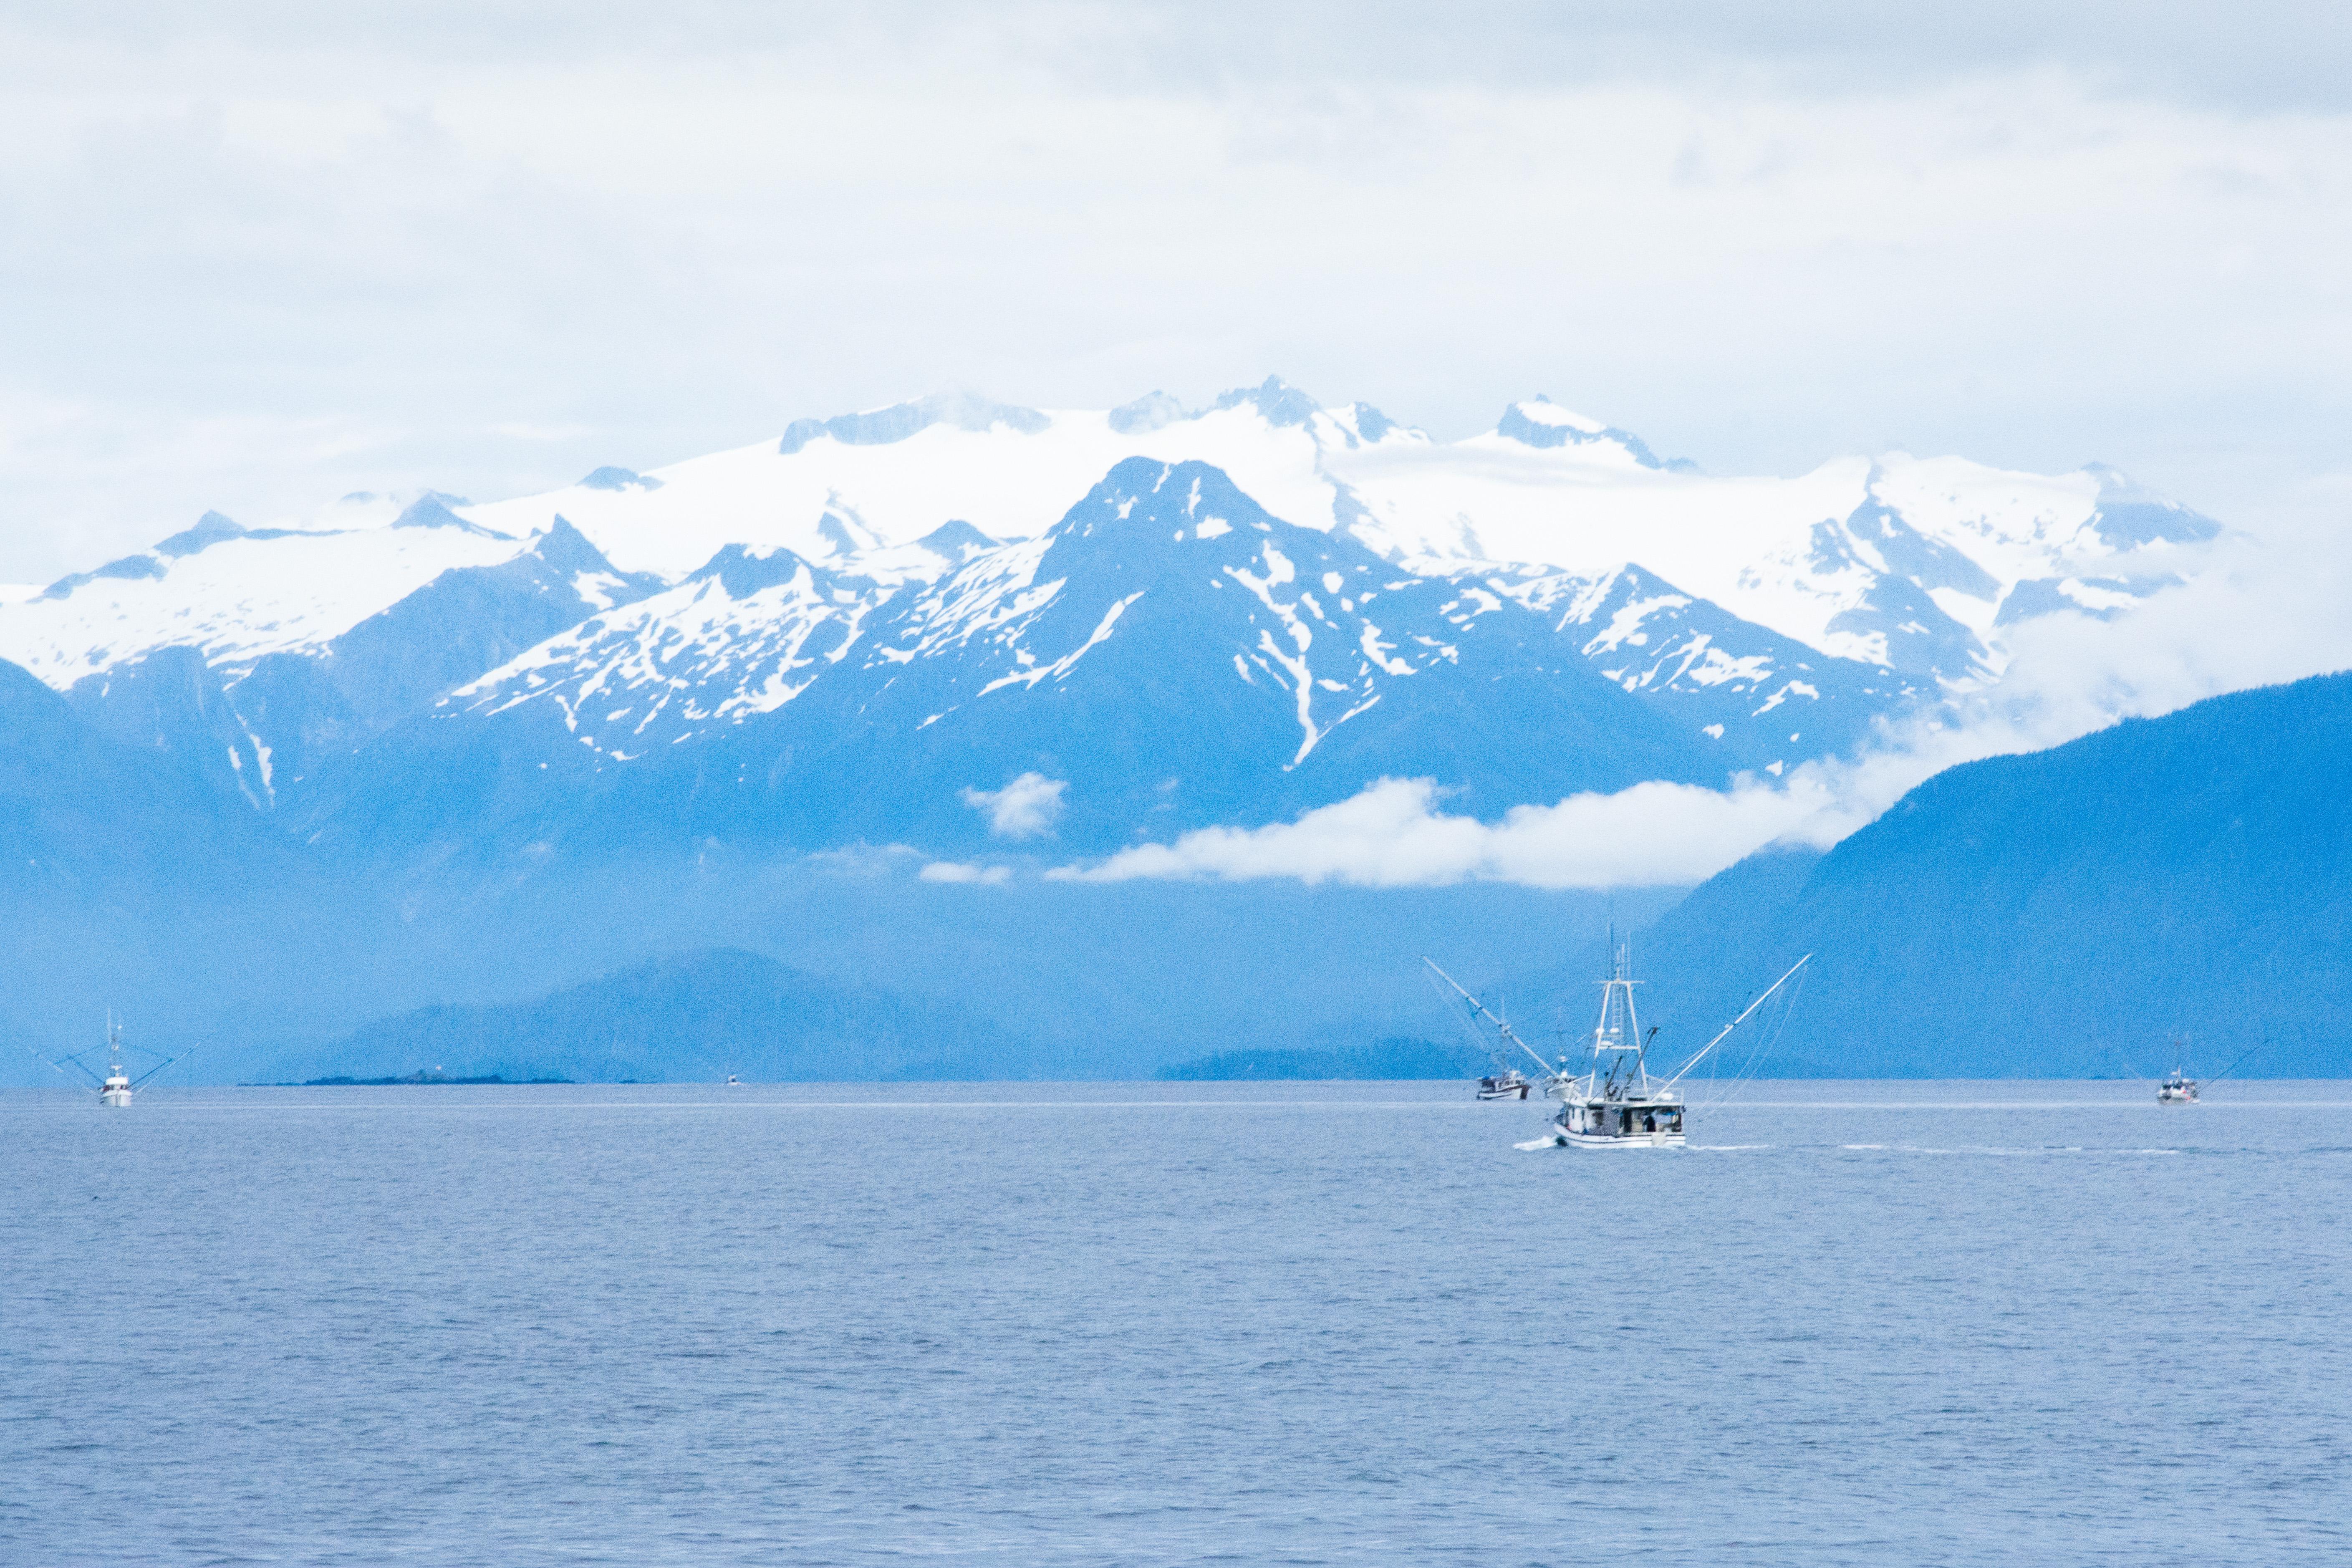 LioneClare_fishingboats-1.jpg